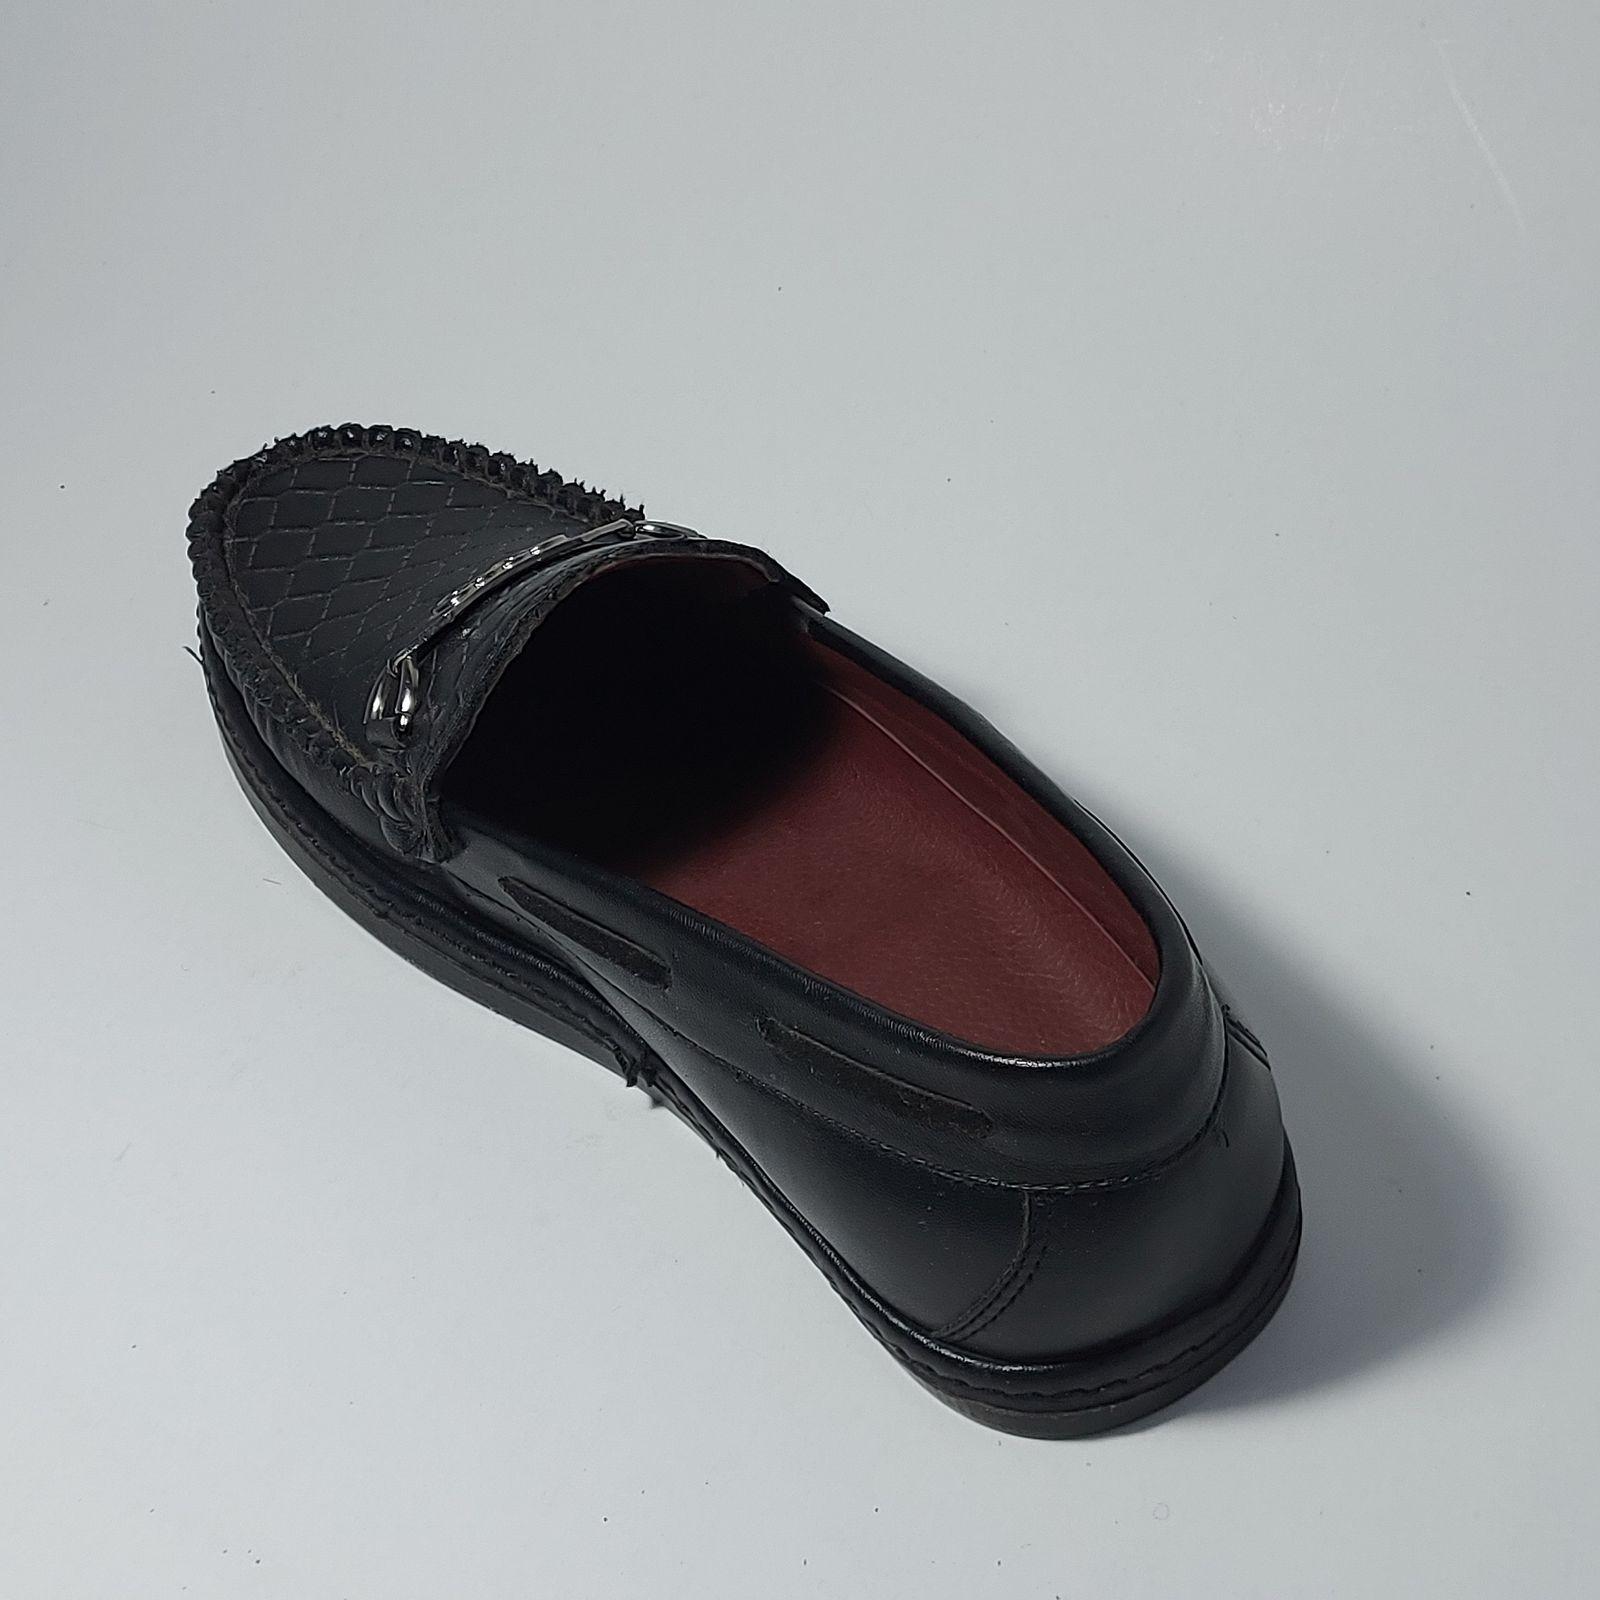 کفش روزمره مردانه مدل CH008 -  - 6